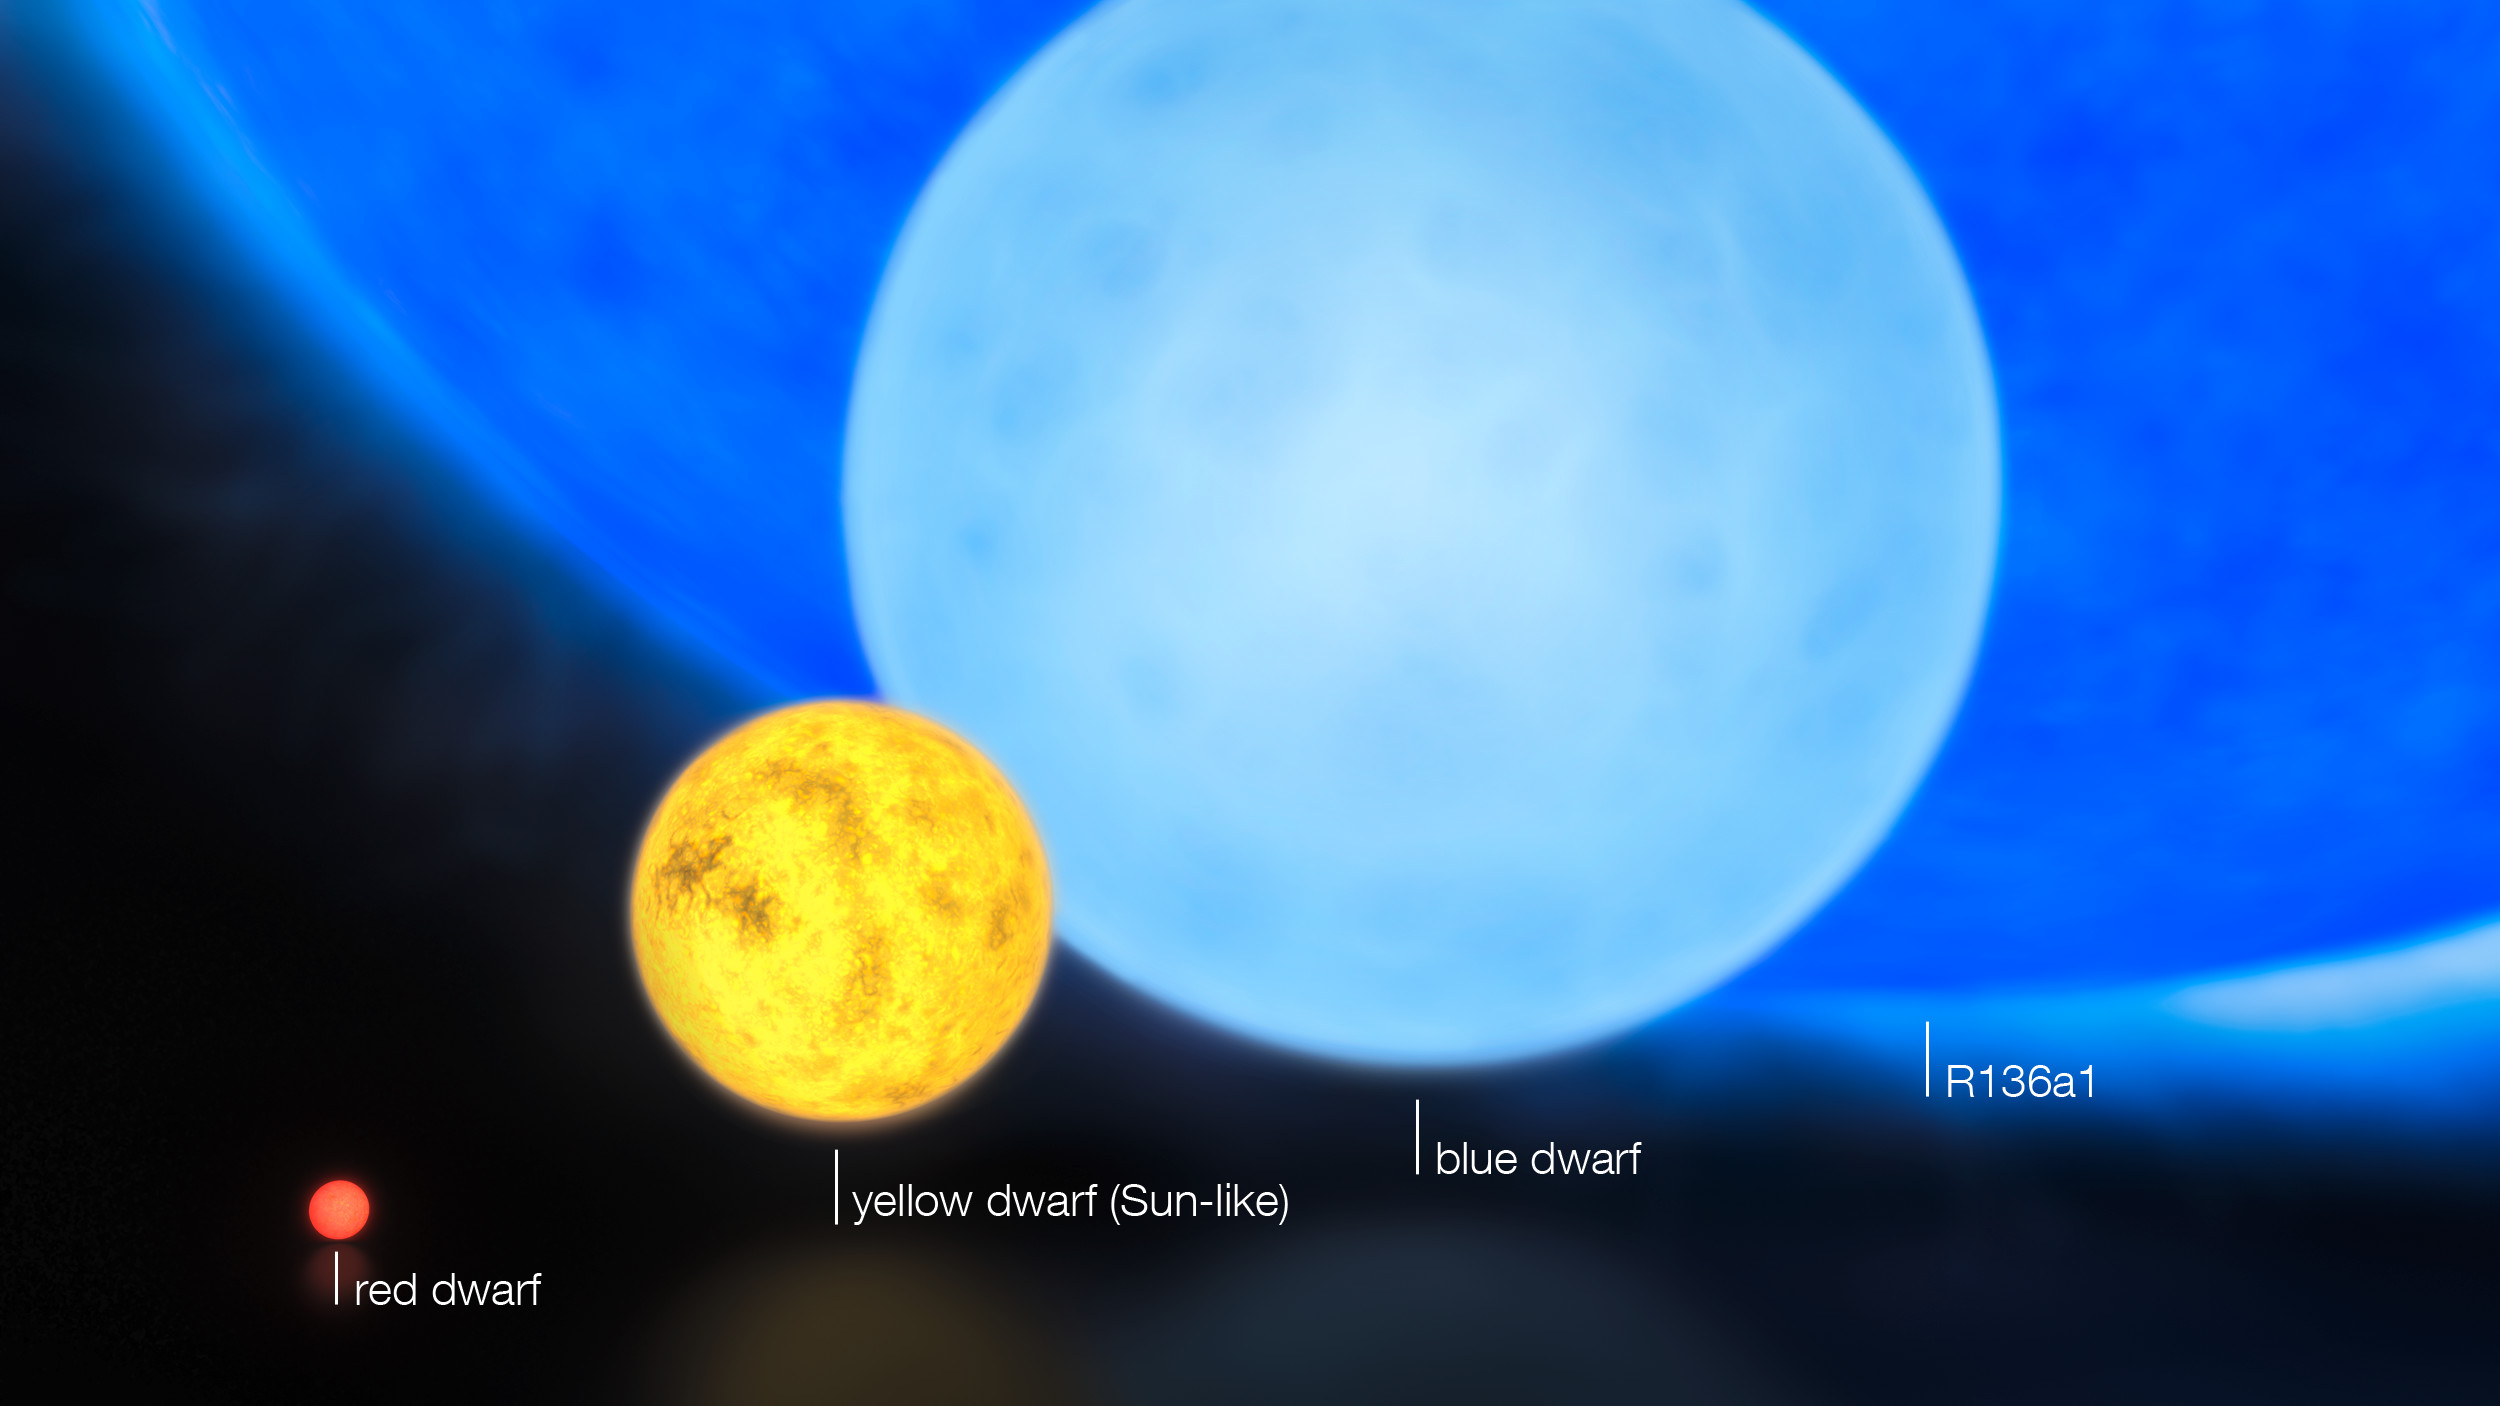 STARS | Learn astronomy